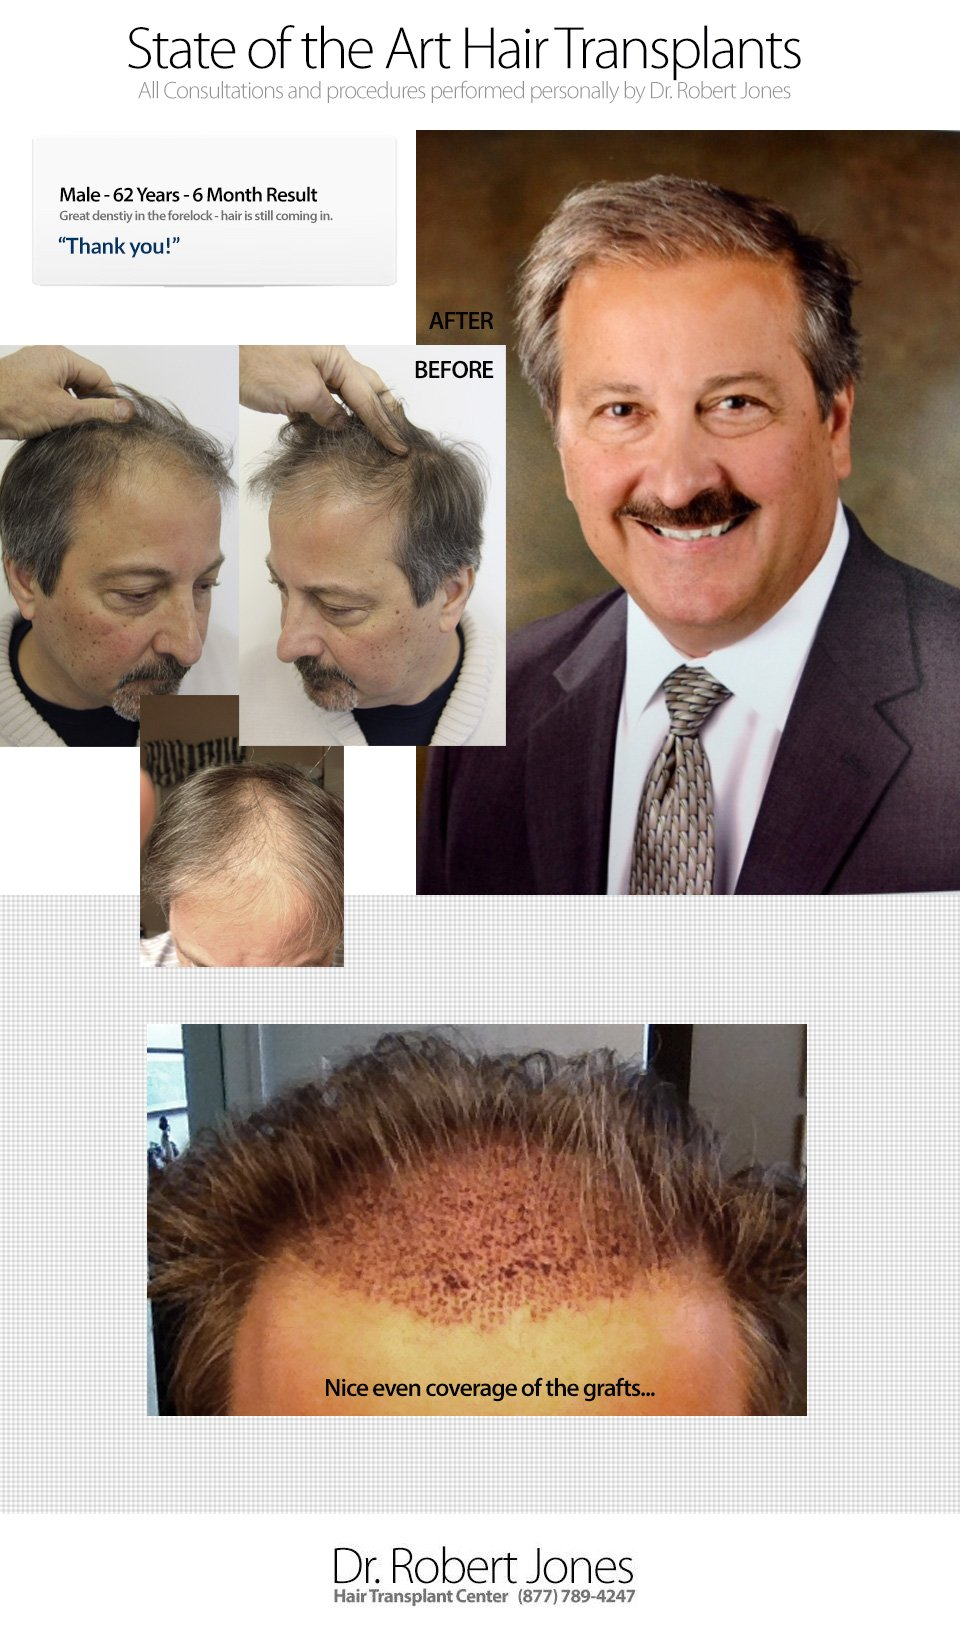 2014-9-17-dr-robert-jones-62yo-male-6-month-post-o-img-1